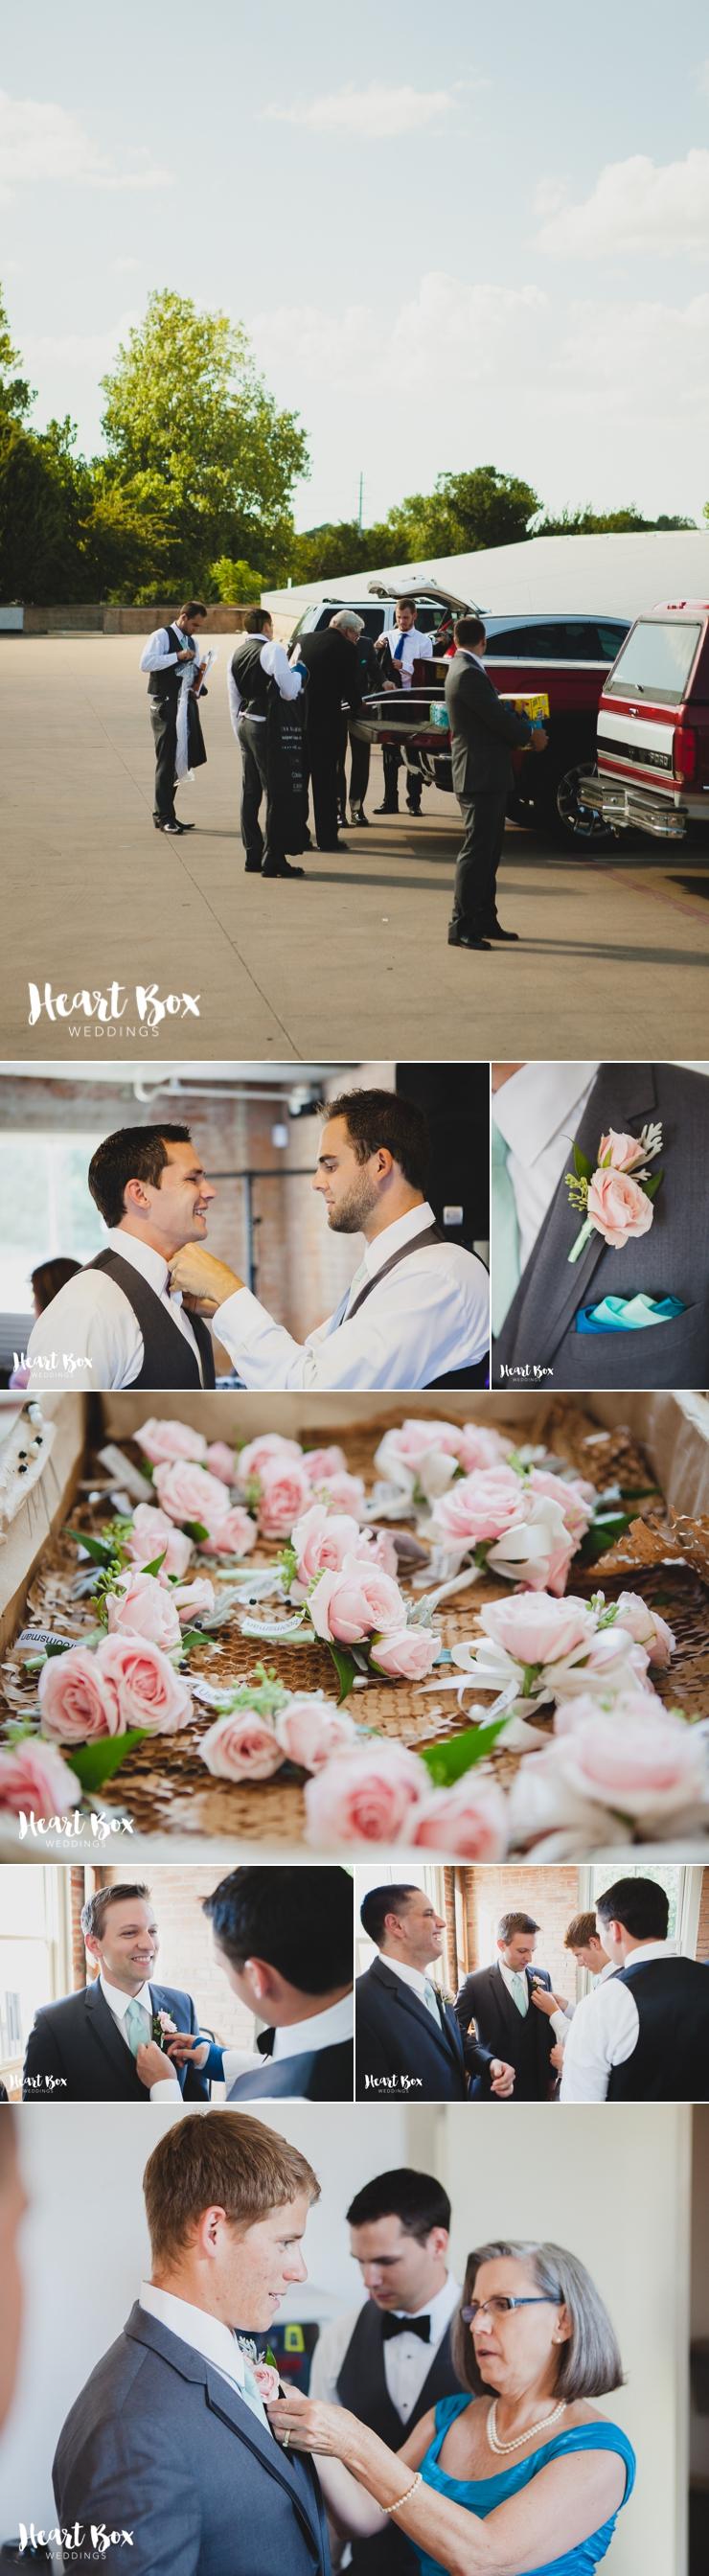 Gould Wedding Blog Collages 4.jpg